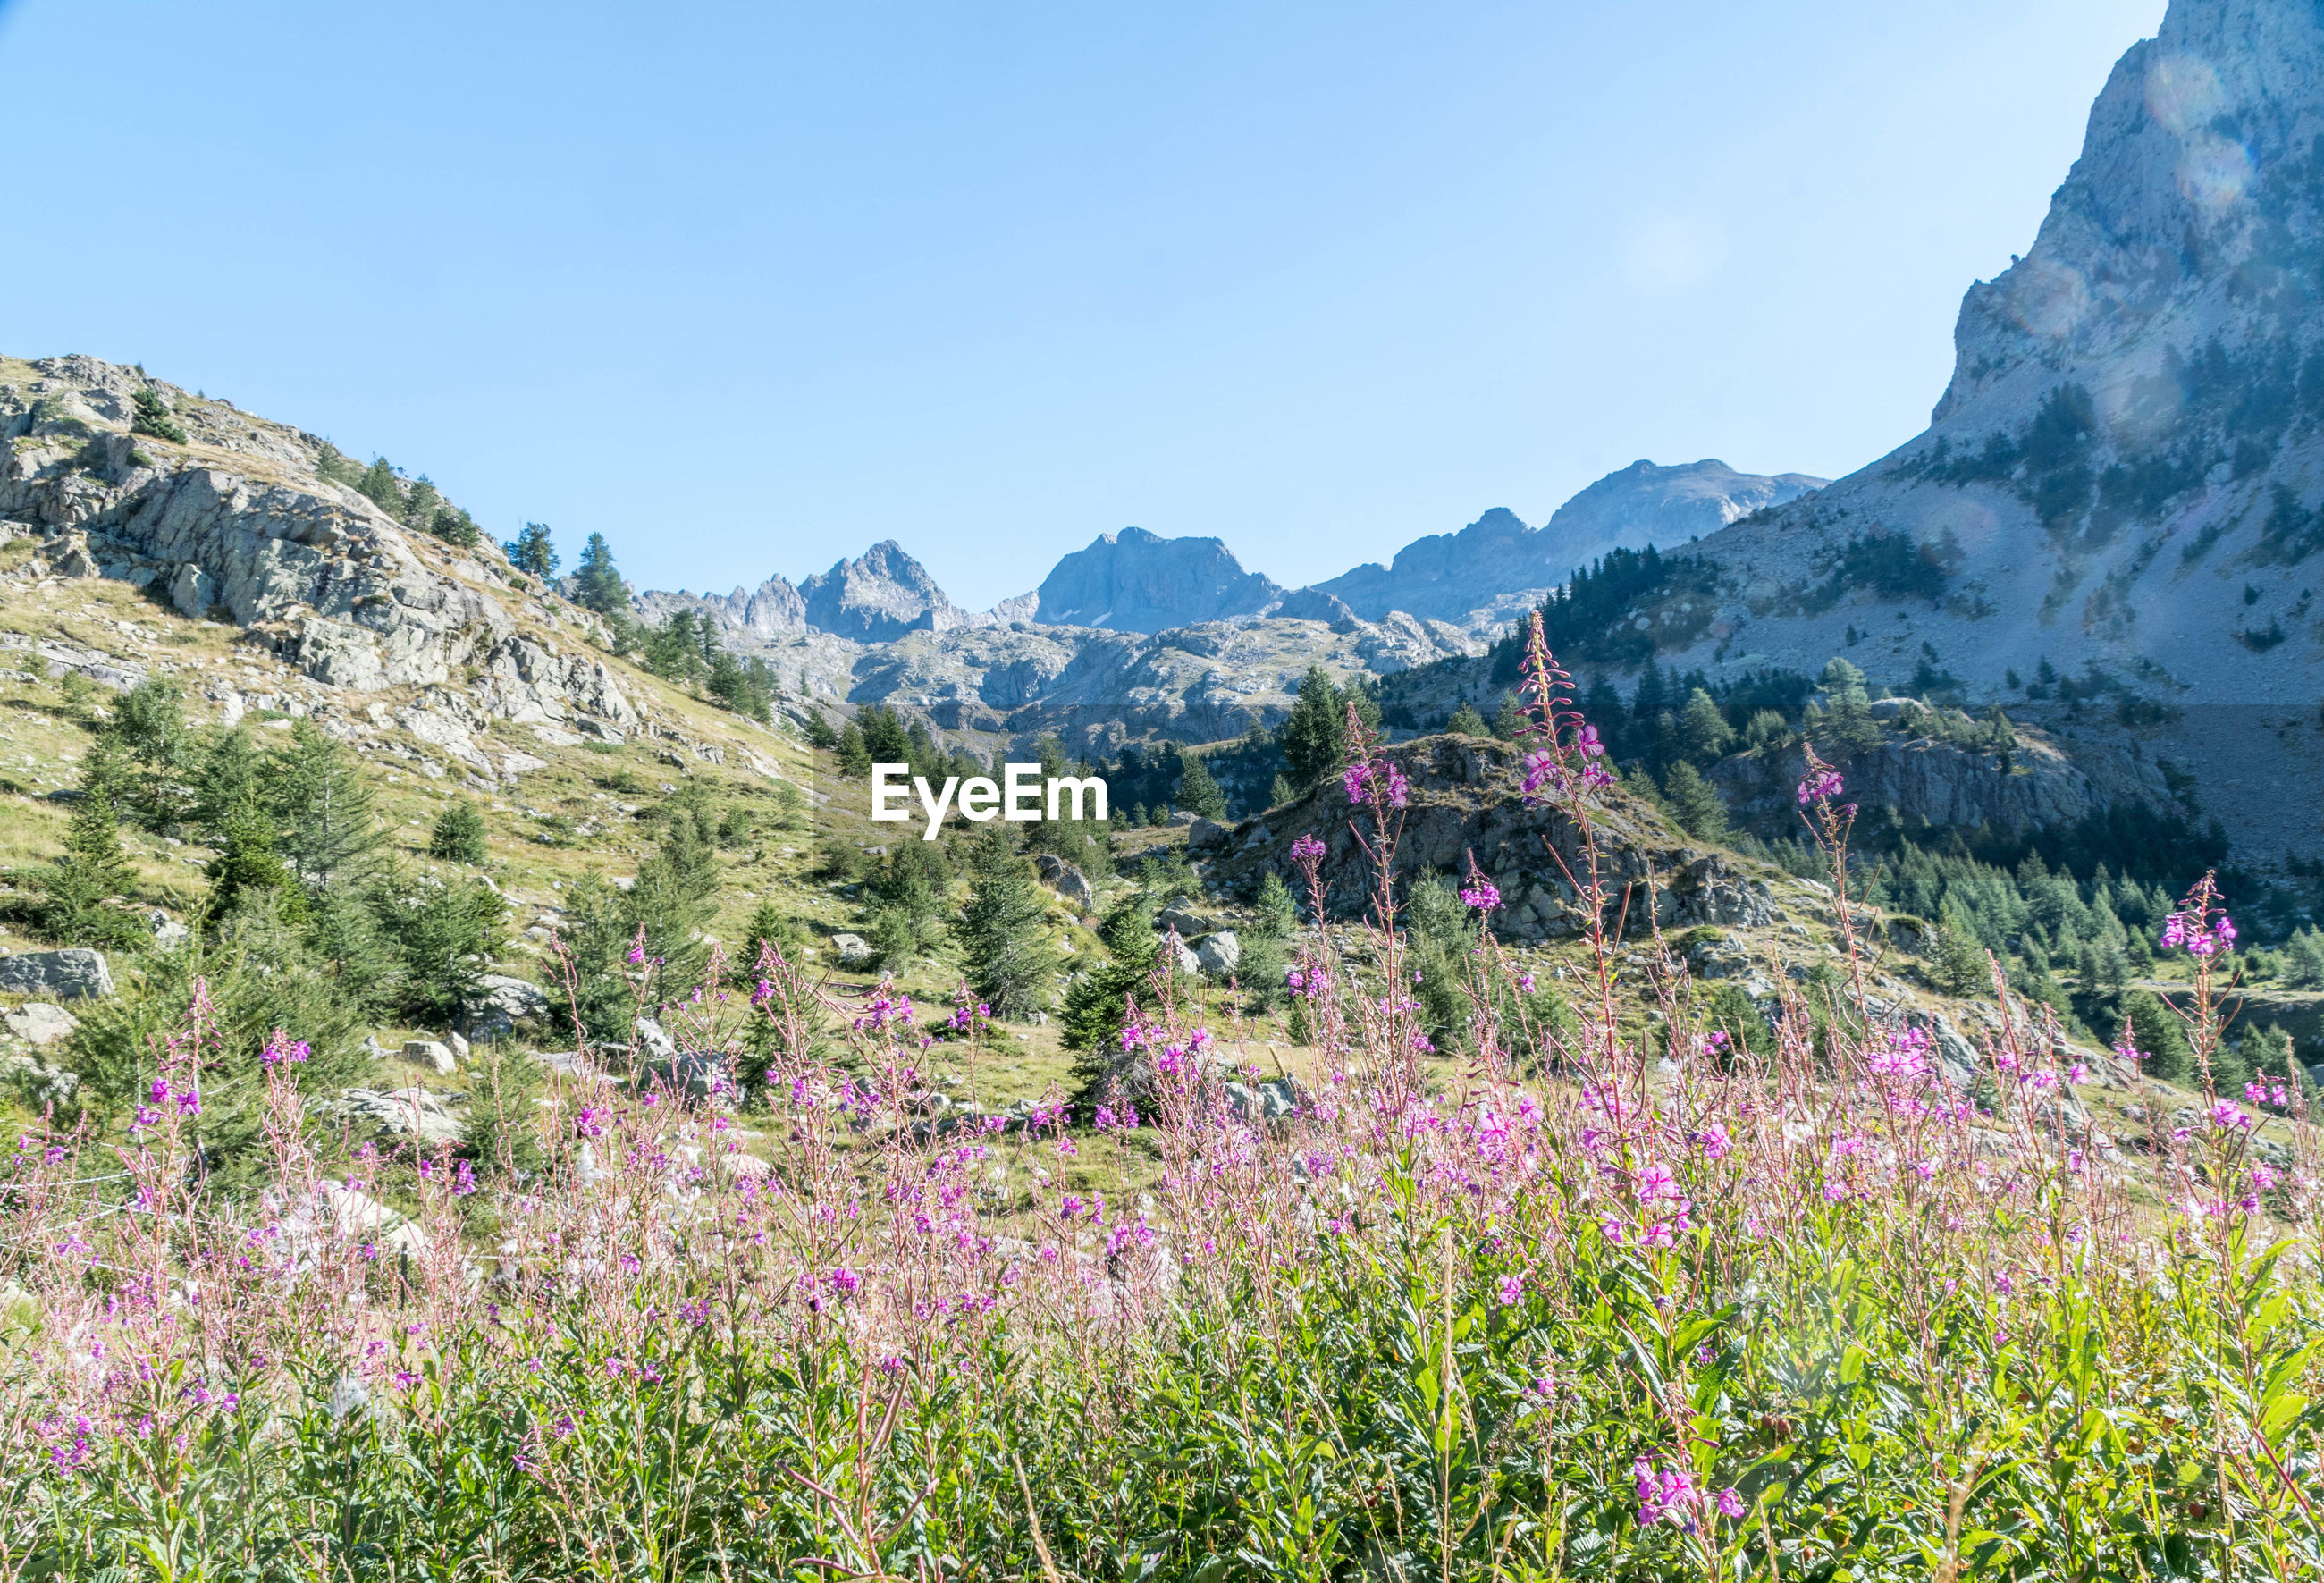 PURPLE FLOWERING PLANTS ON FIELD AGAINST MOUNTAINS